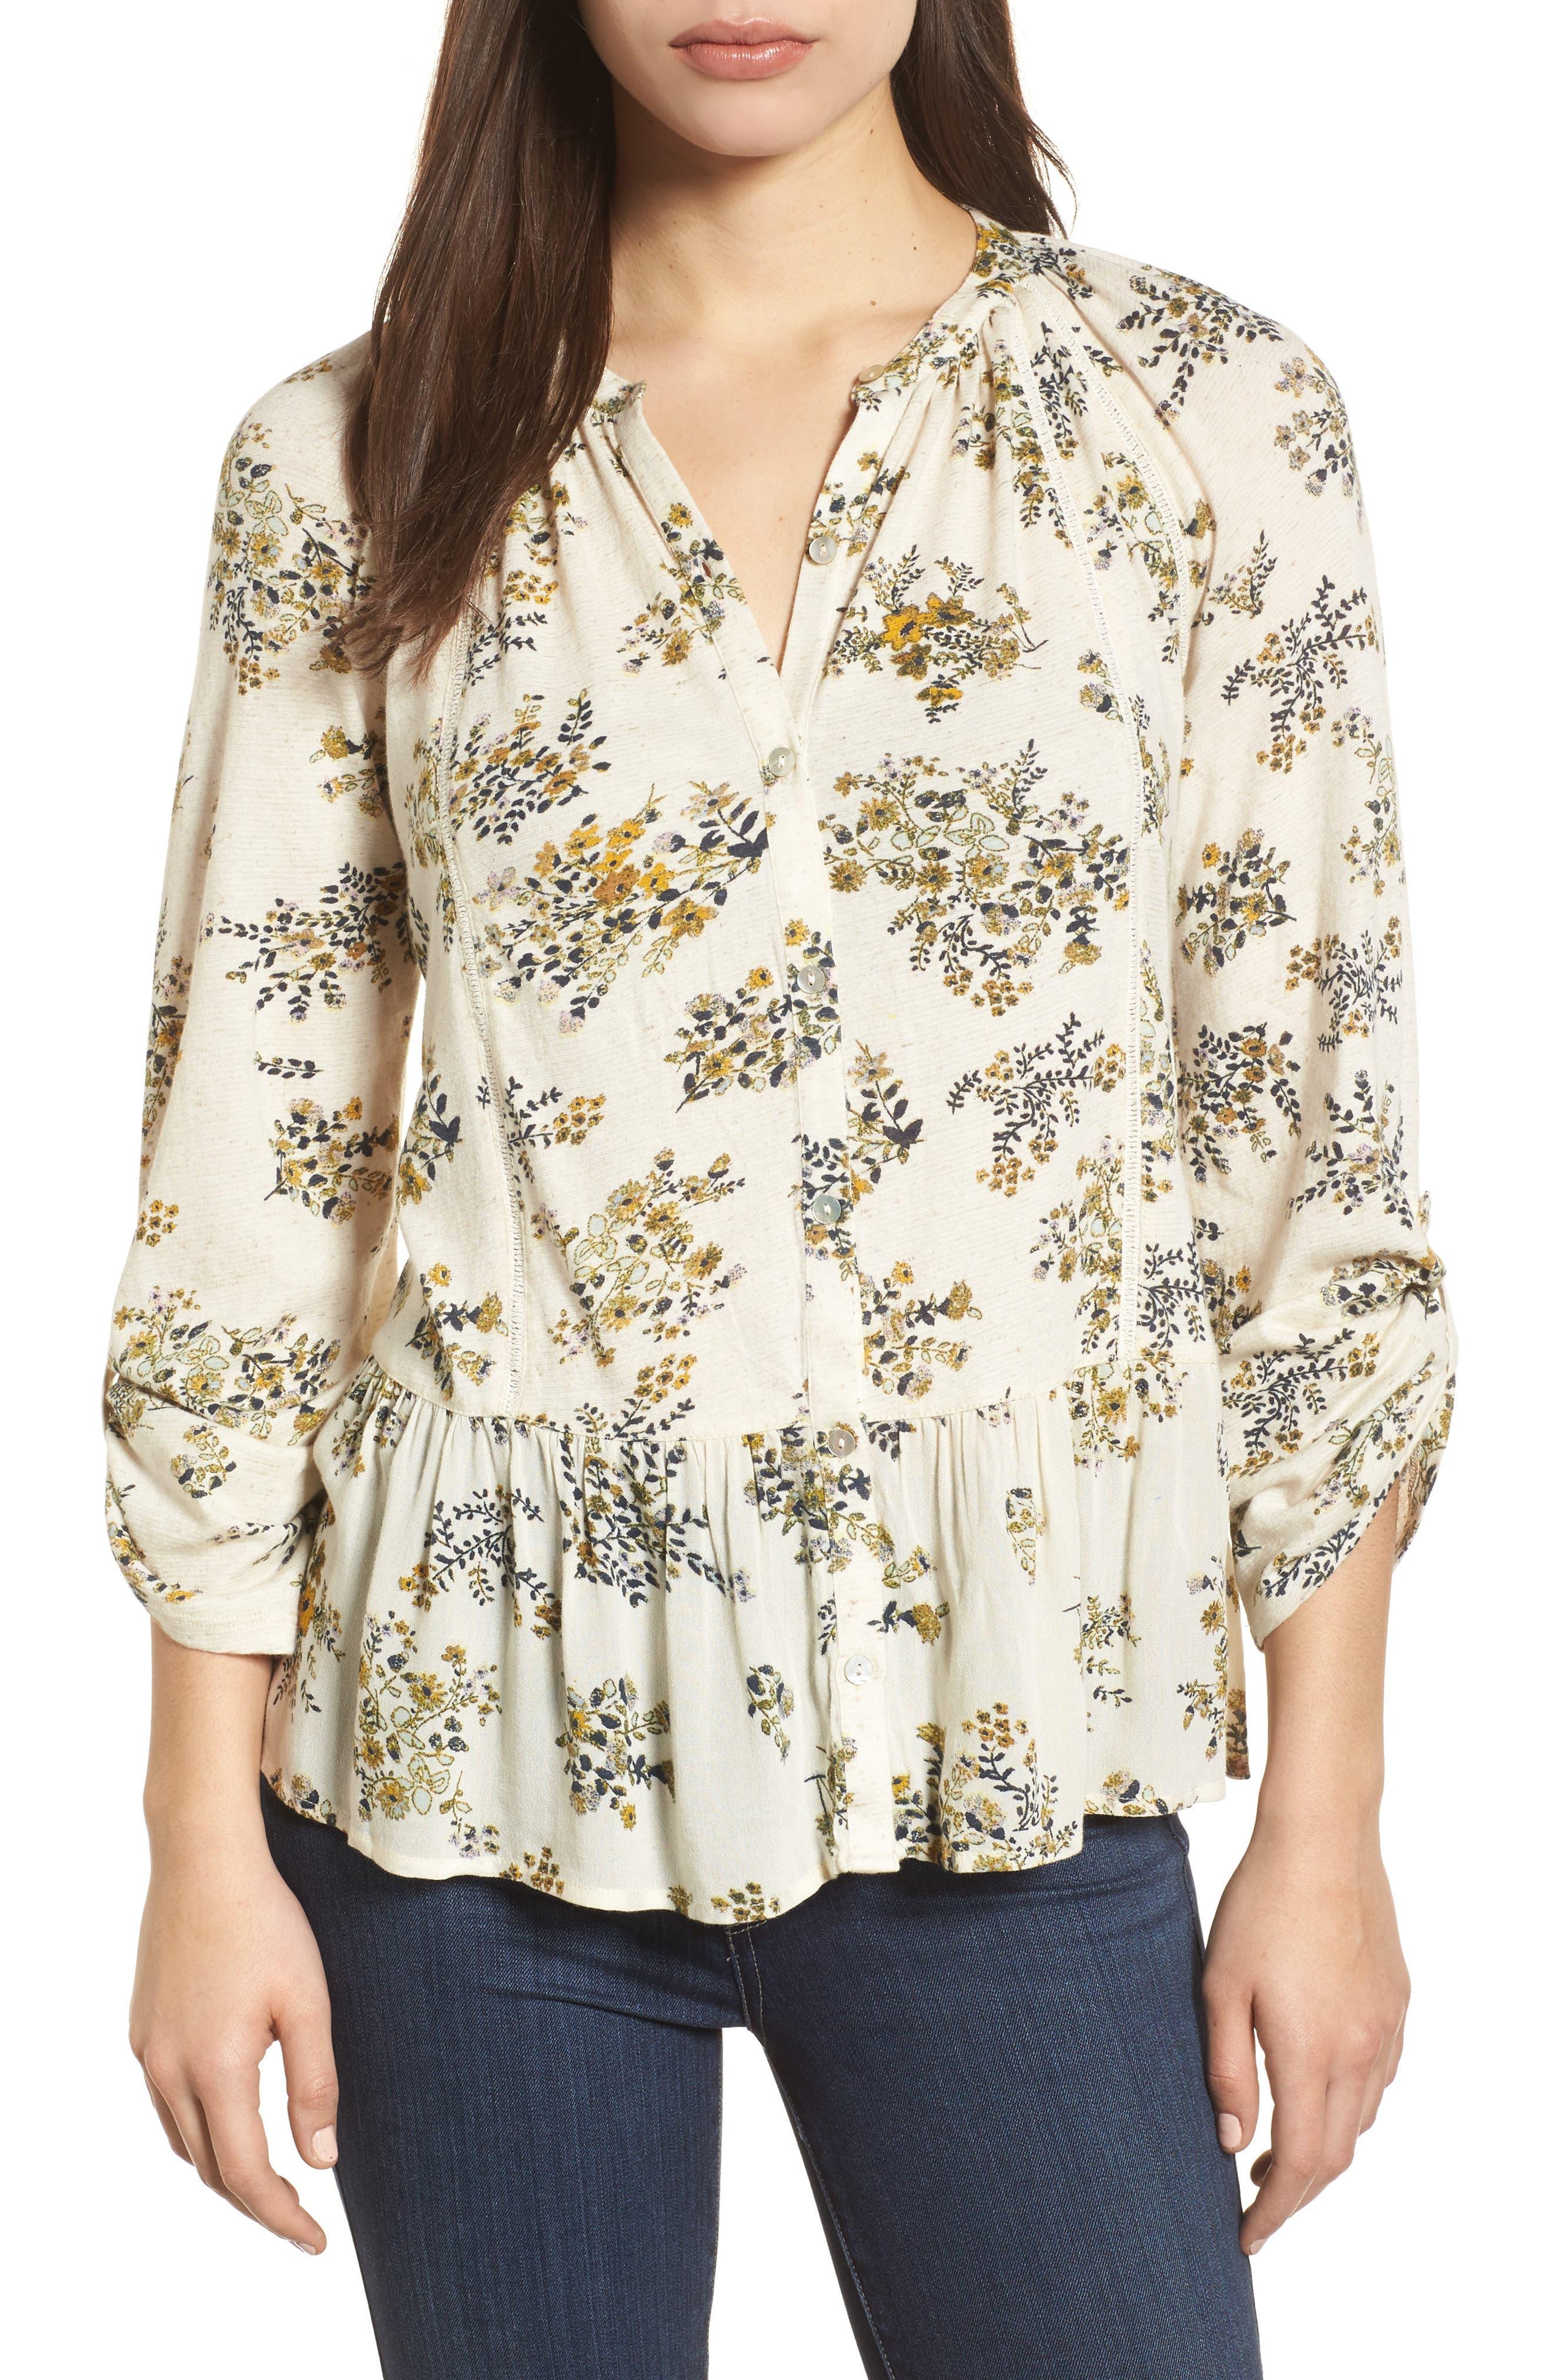 Main Image - Lucky Brand Floral Print Peplum Top